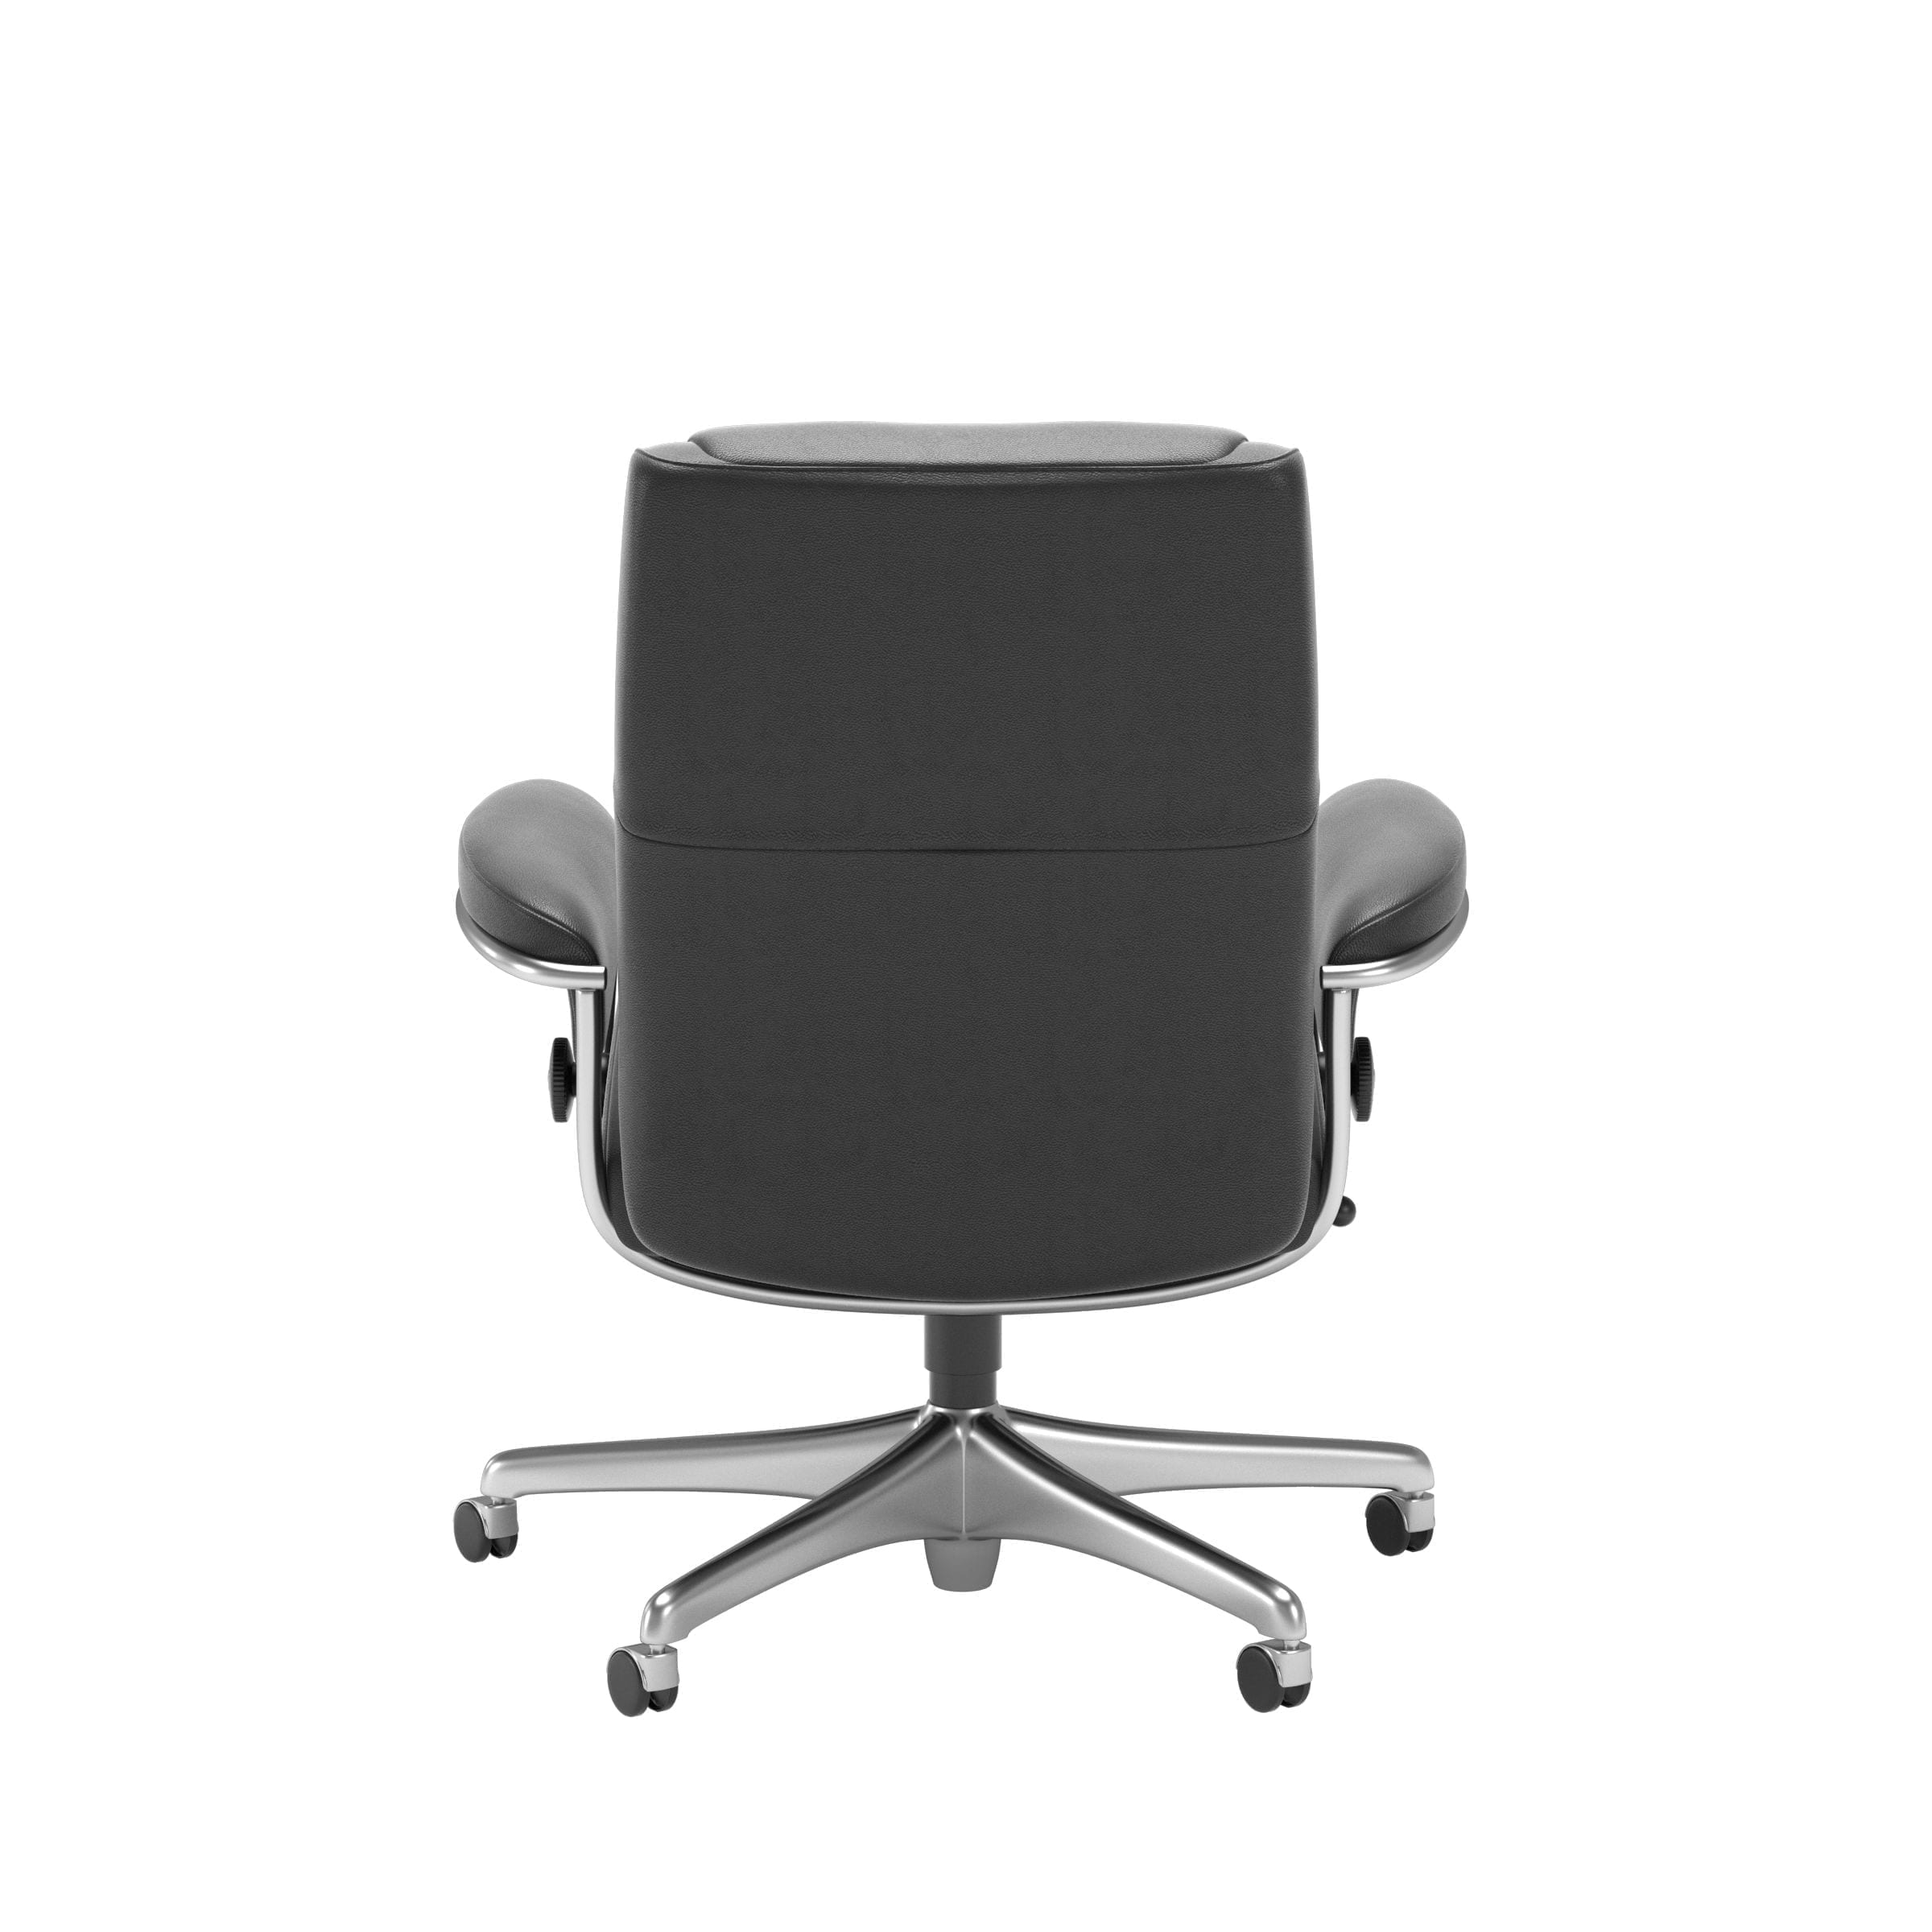 Office Chair Low Back Paris Stressless 3